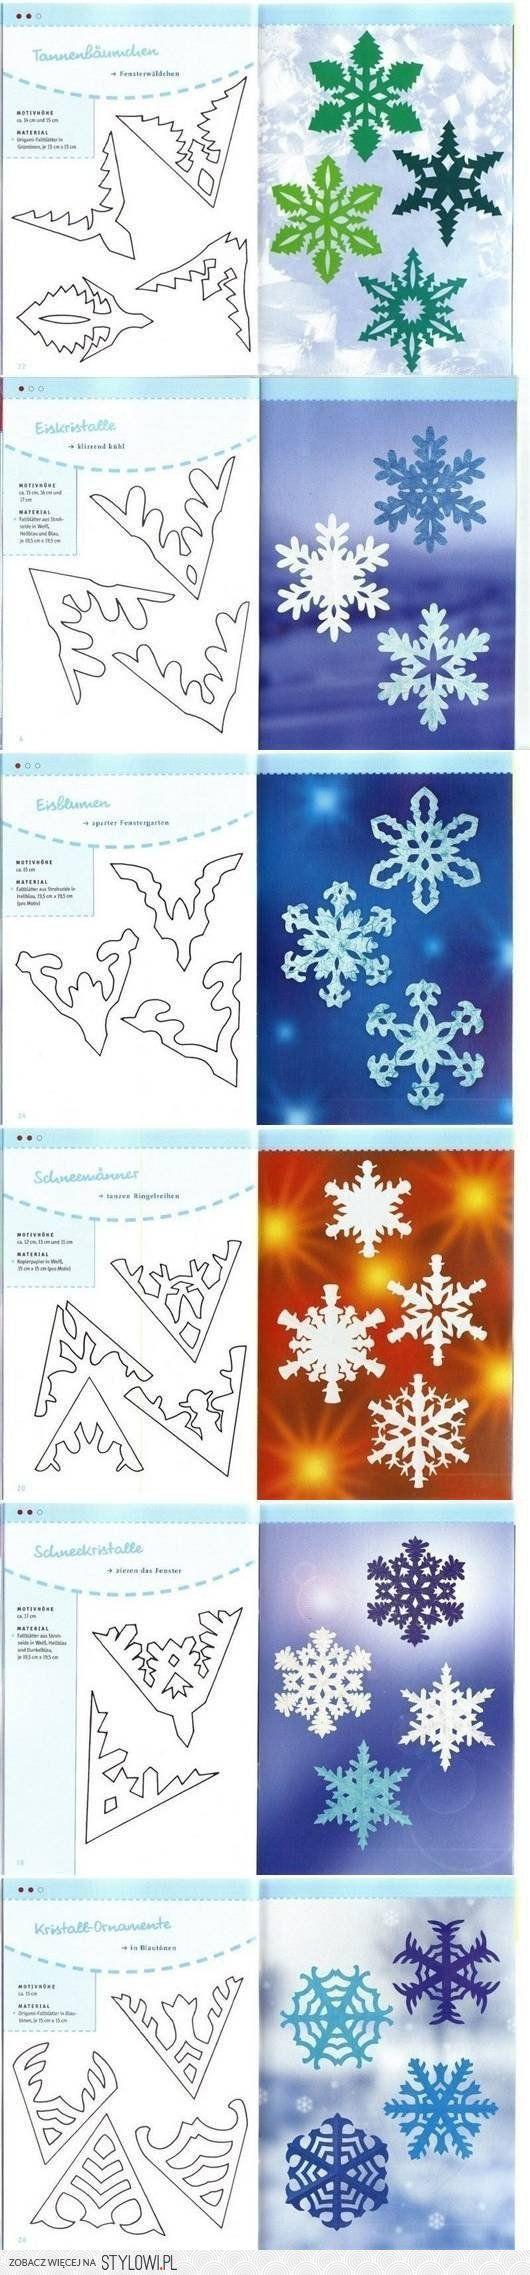 DIY Paper Schemes Snowflakes DIY Projects   UsefulDIY.c…